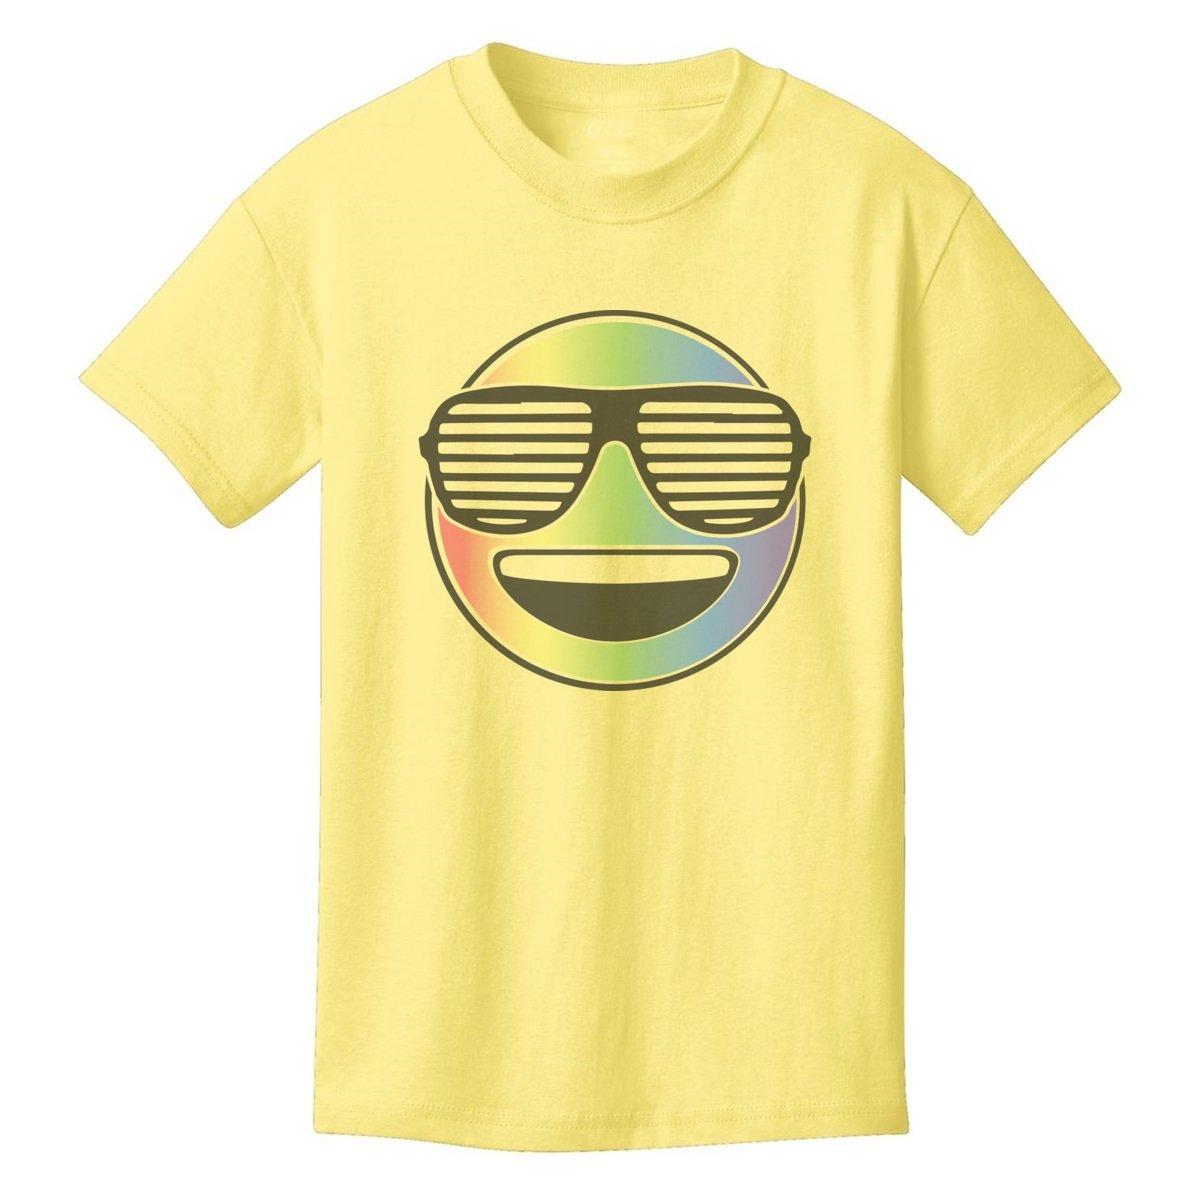 Digital T-Shirt Shop Boys Cool Rainbow Happy Emoji with Sunglasses X-Small YELLOW by Digital T-Shirt Shop